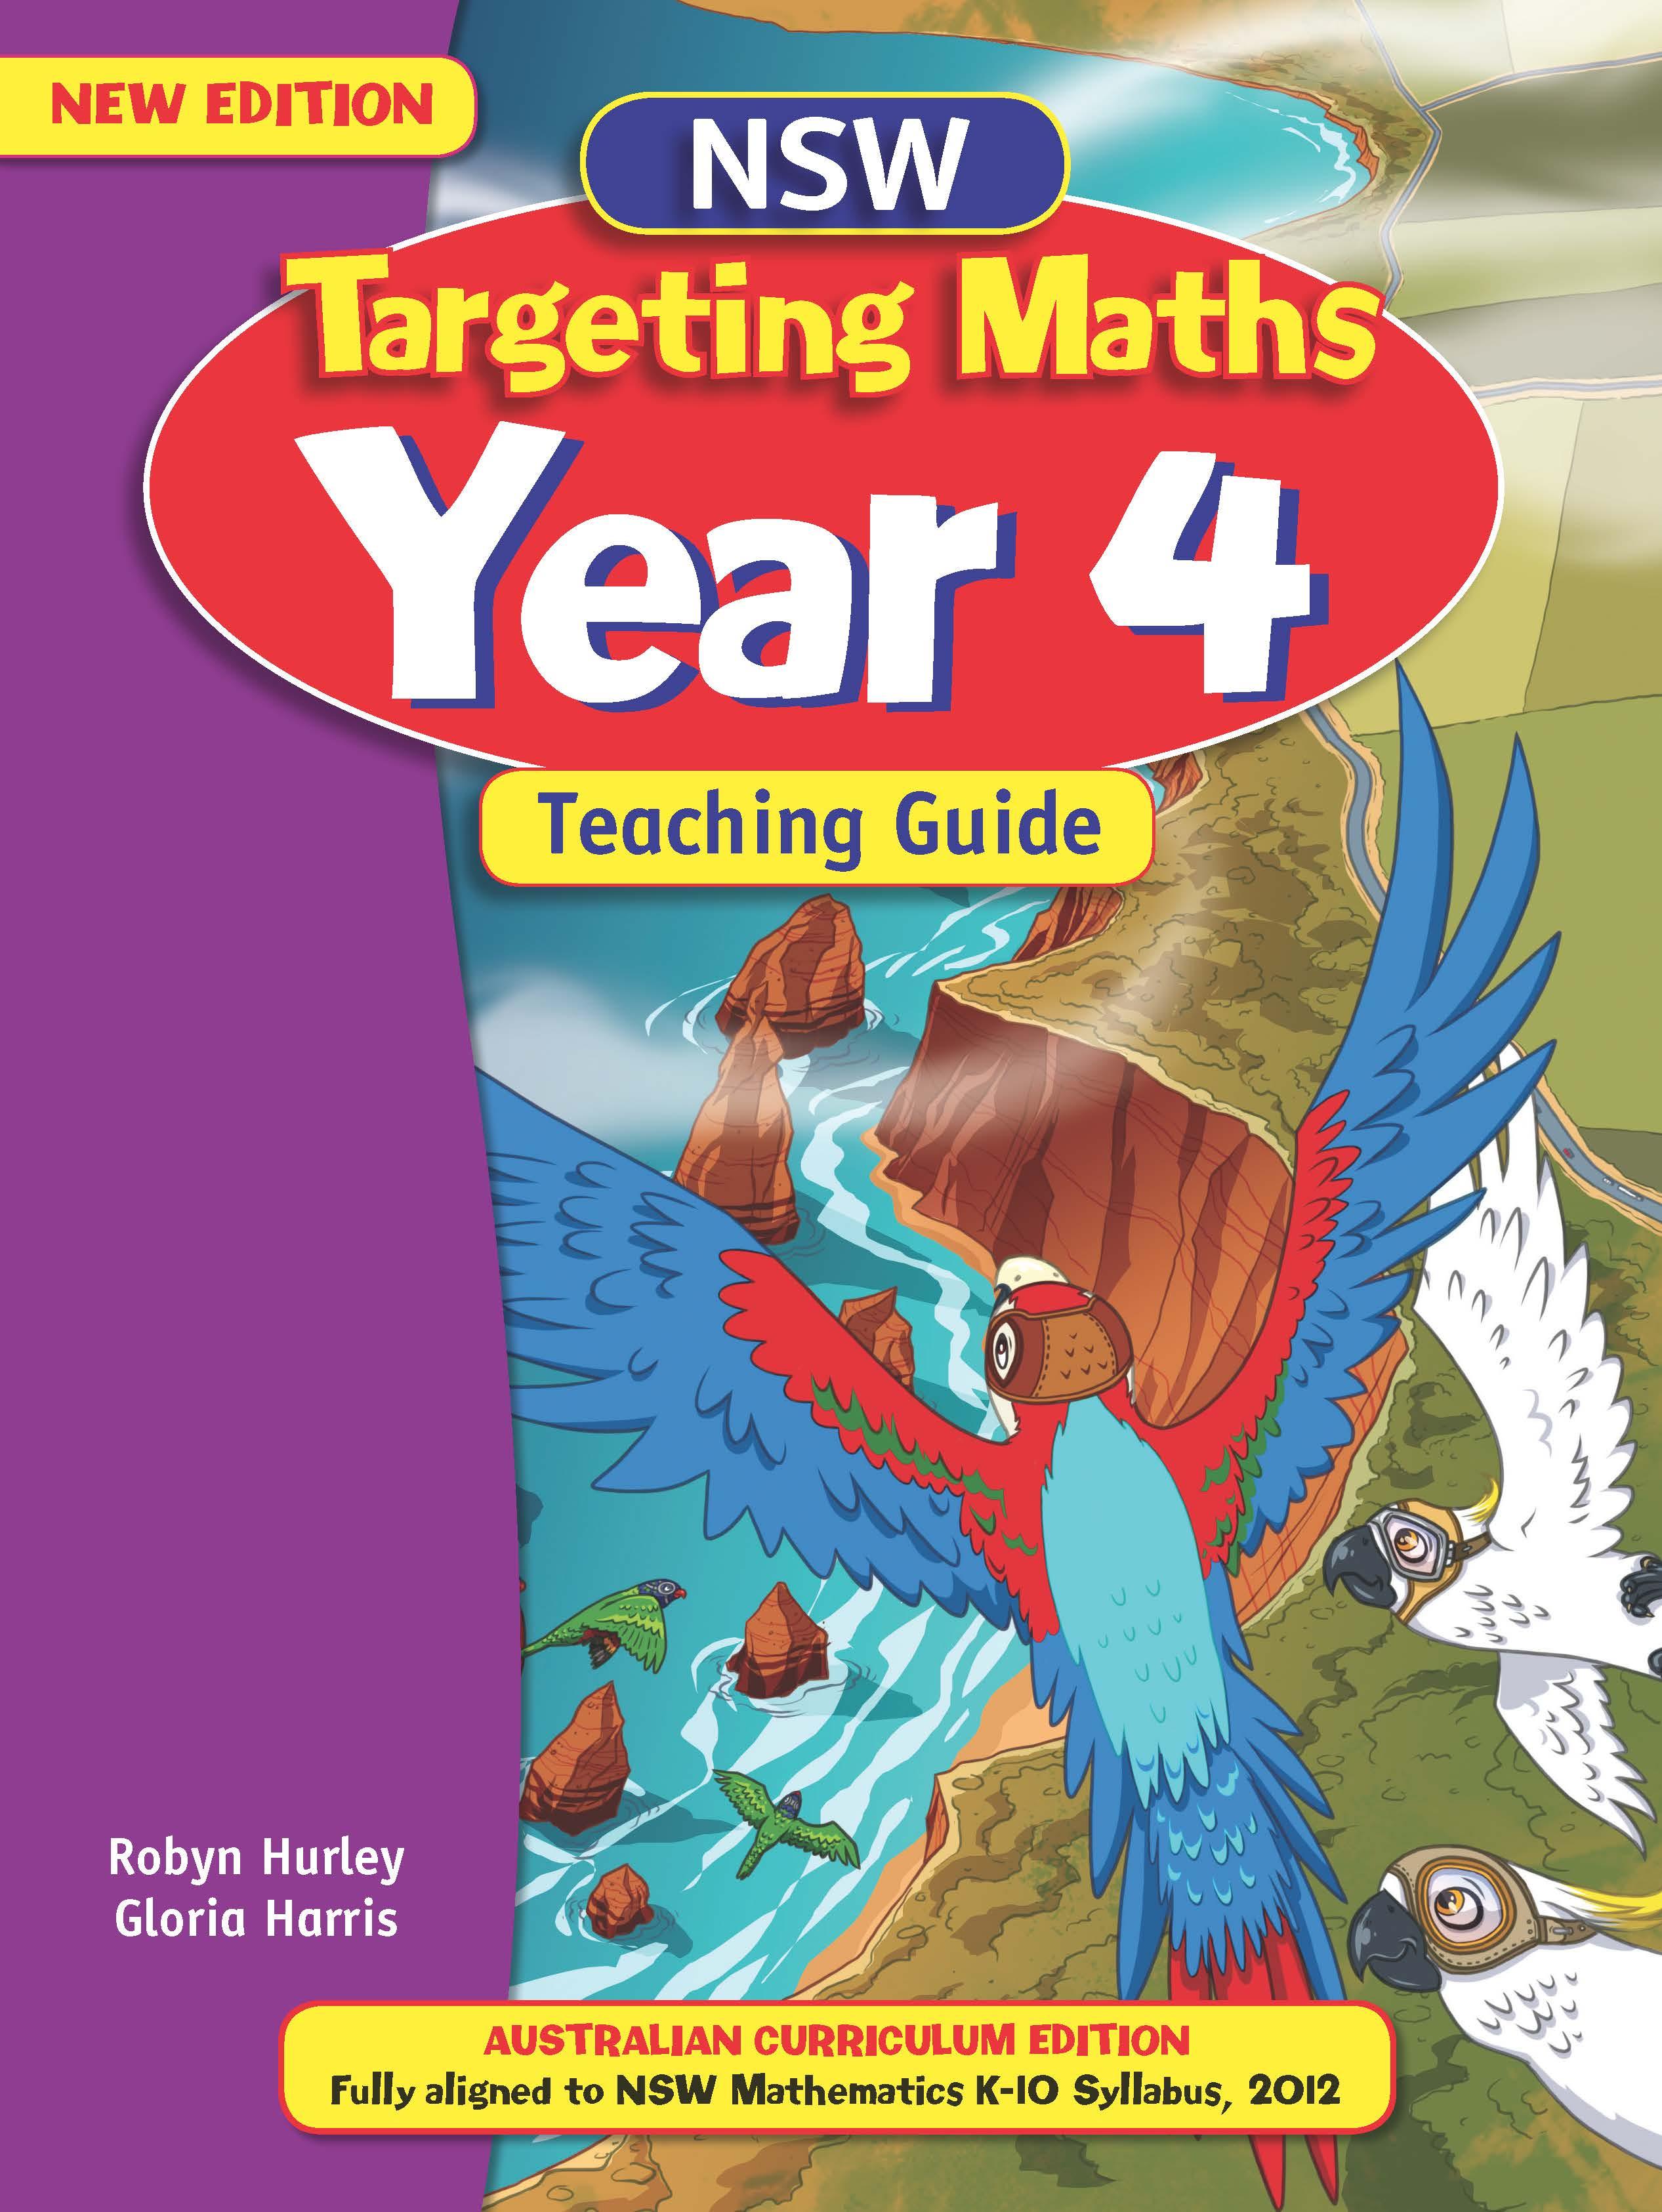 NSW Targeting Maths Australian Curriculum Teaching Guide Year 4